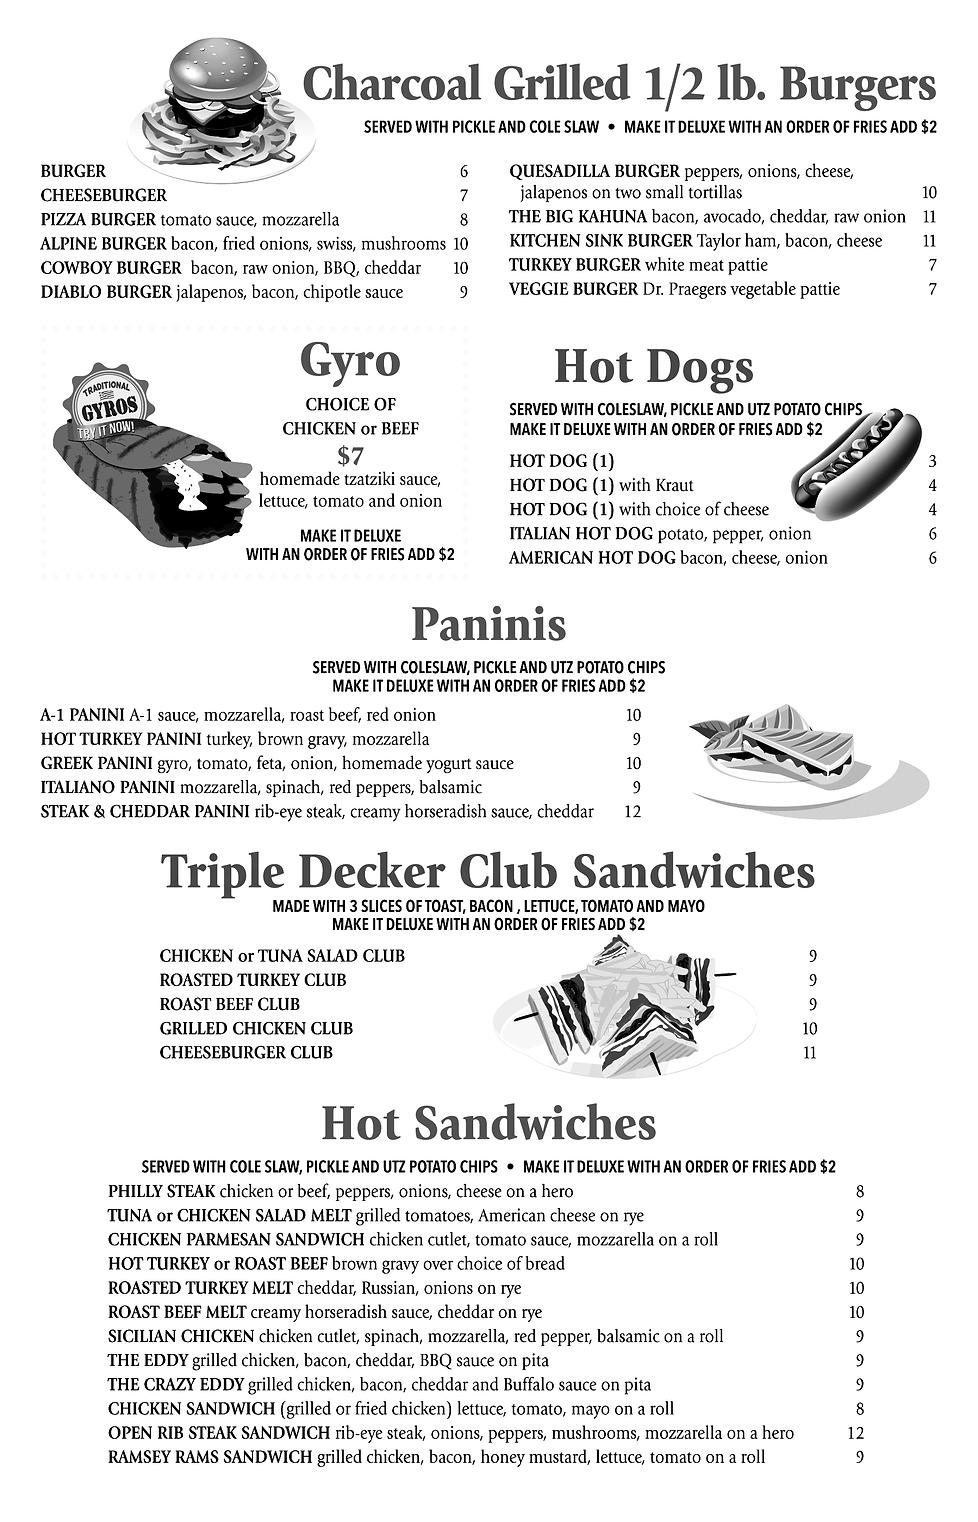 122720-RAMSEY CORNER CAFE-Burgers.tif